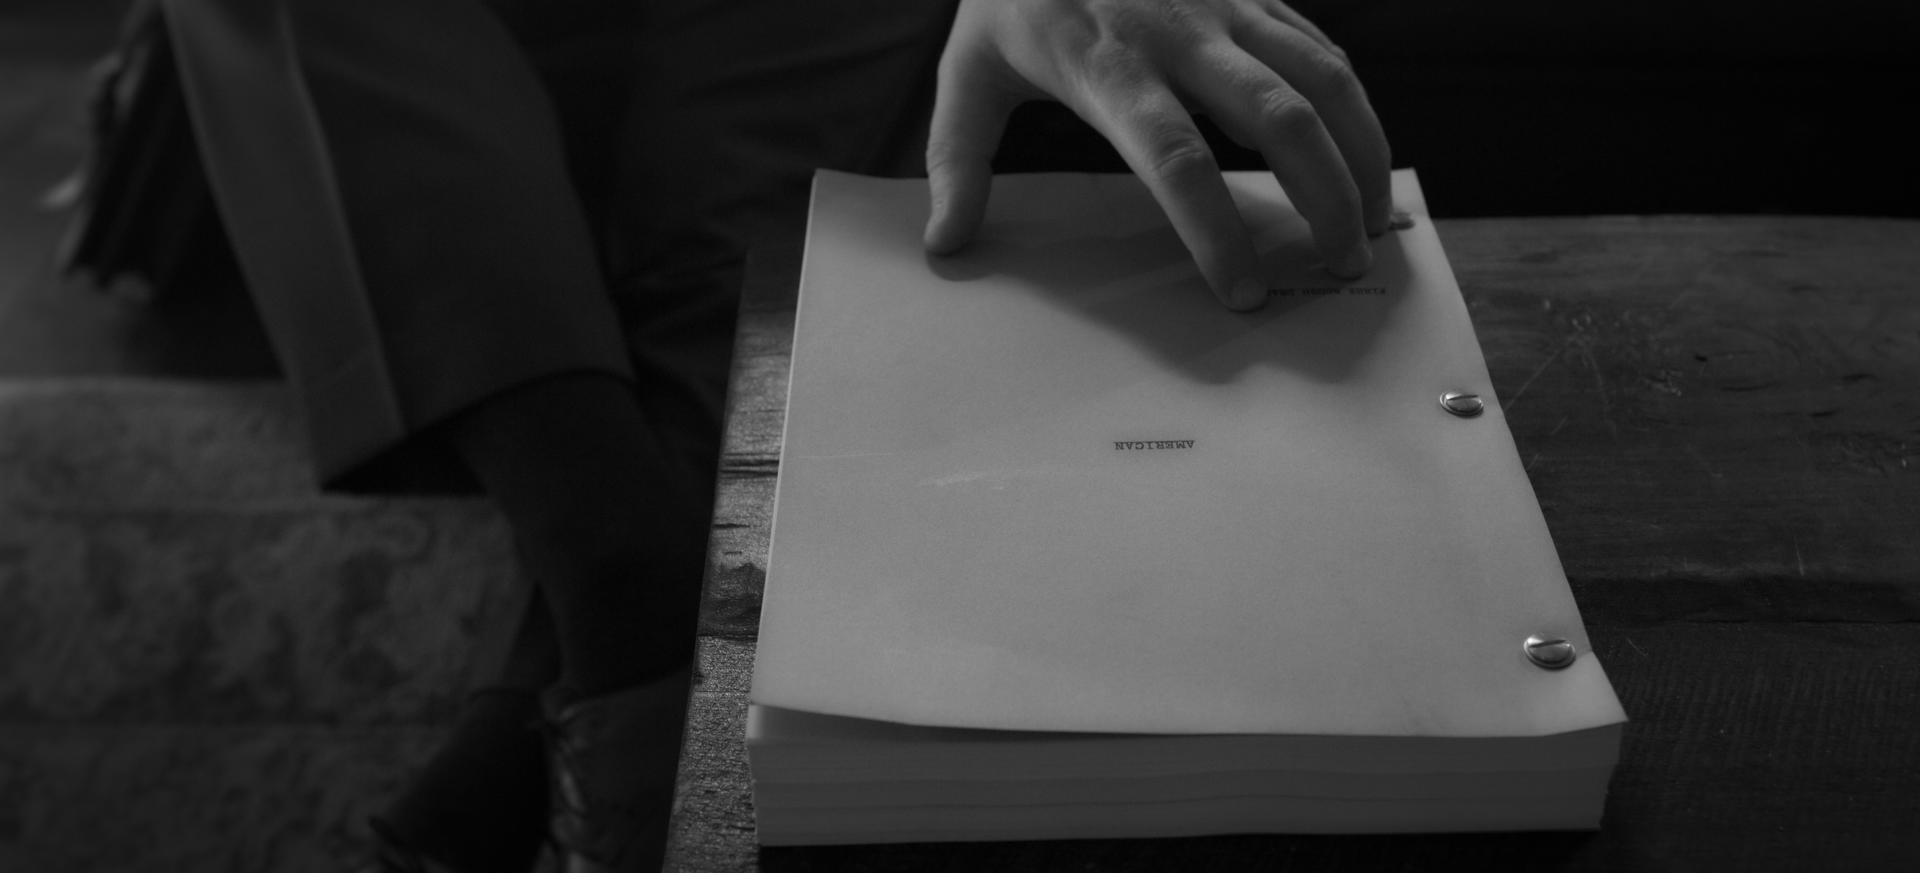 Mank recensione film Netflix di David Fincher con Gary Oldman